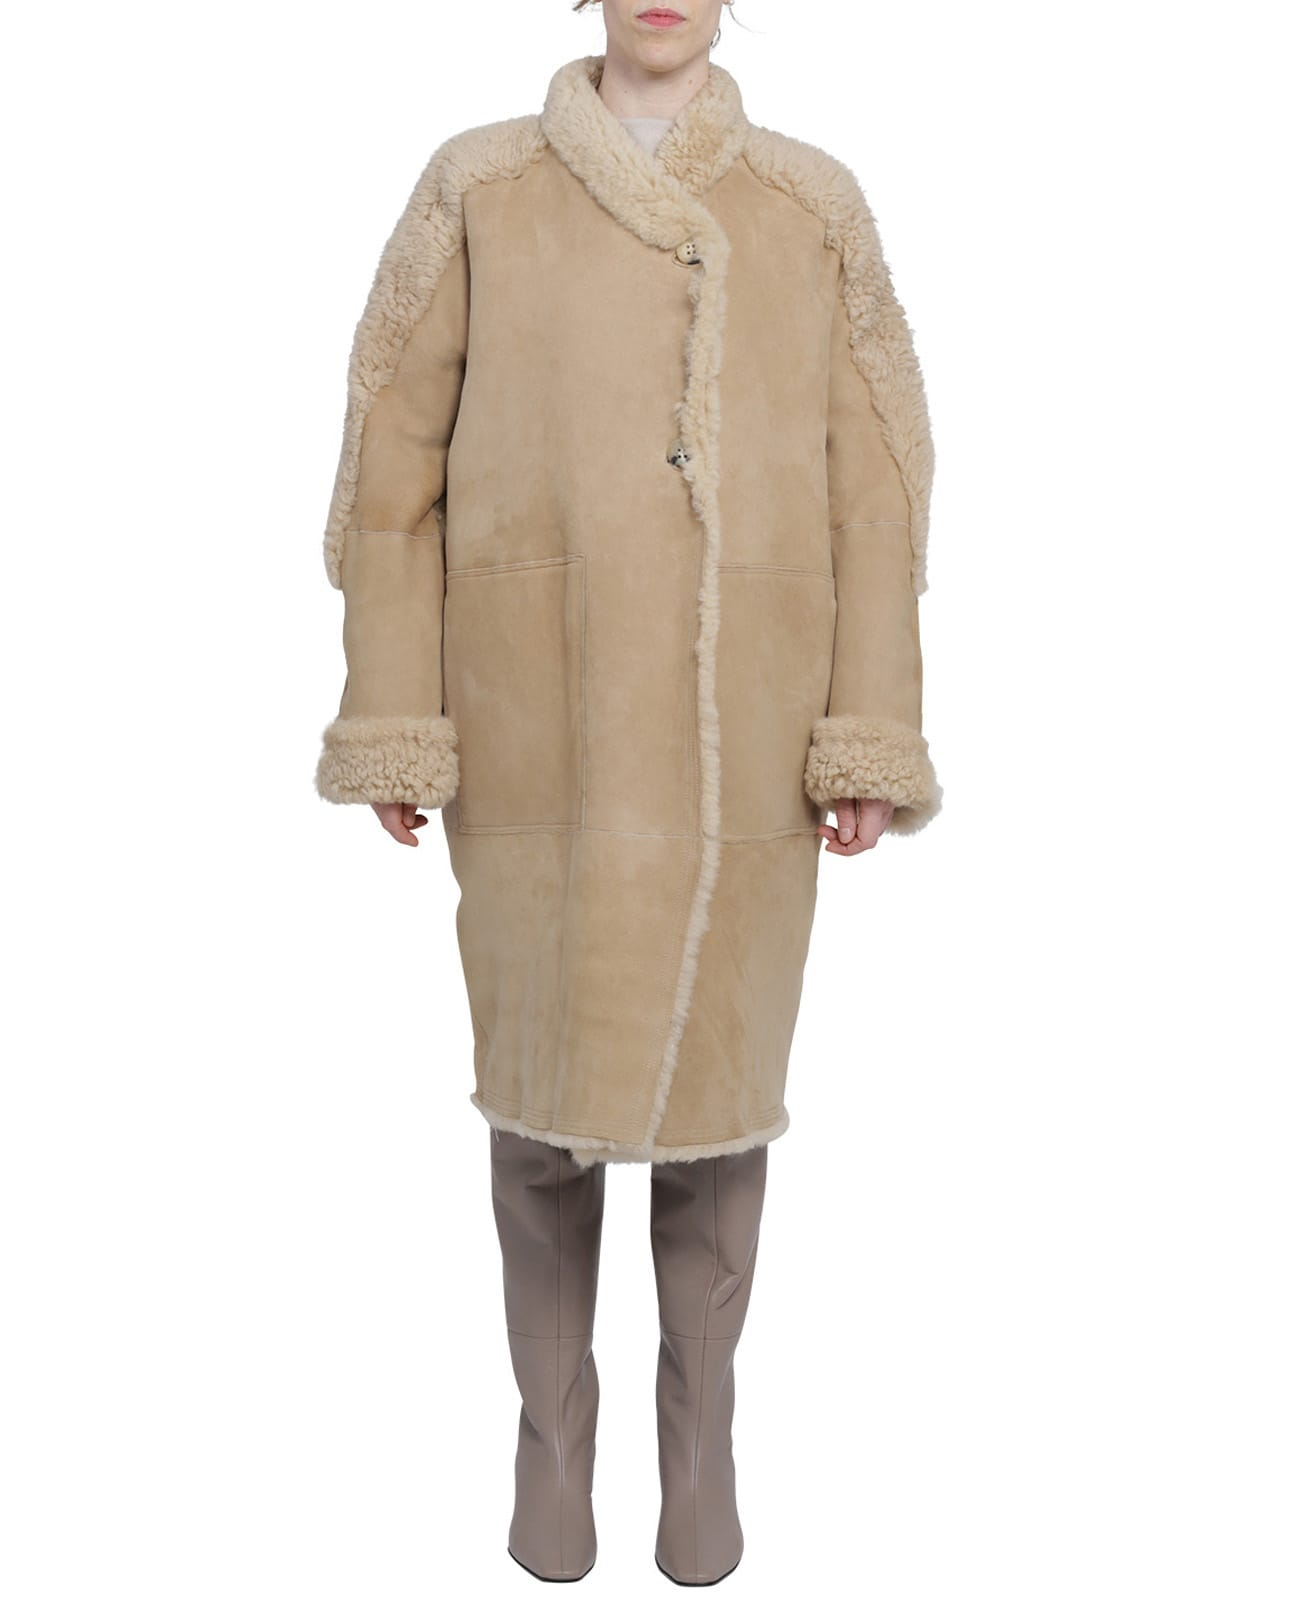 Portofino Beige Shearling Coat